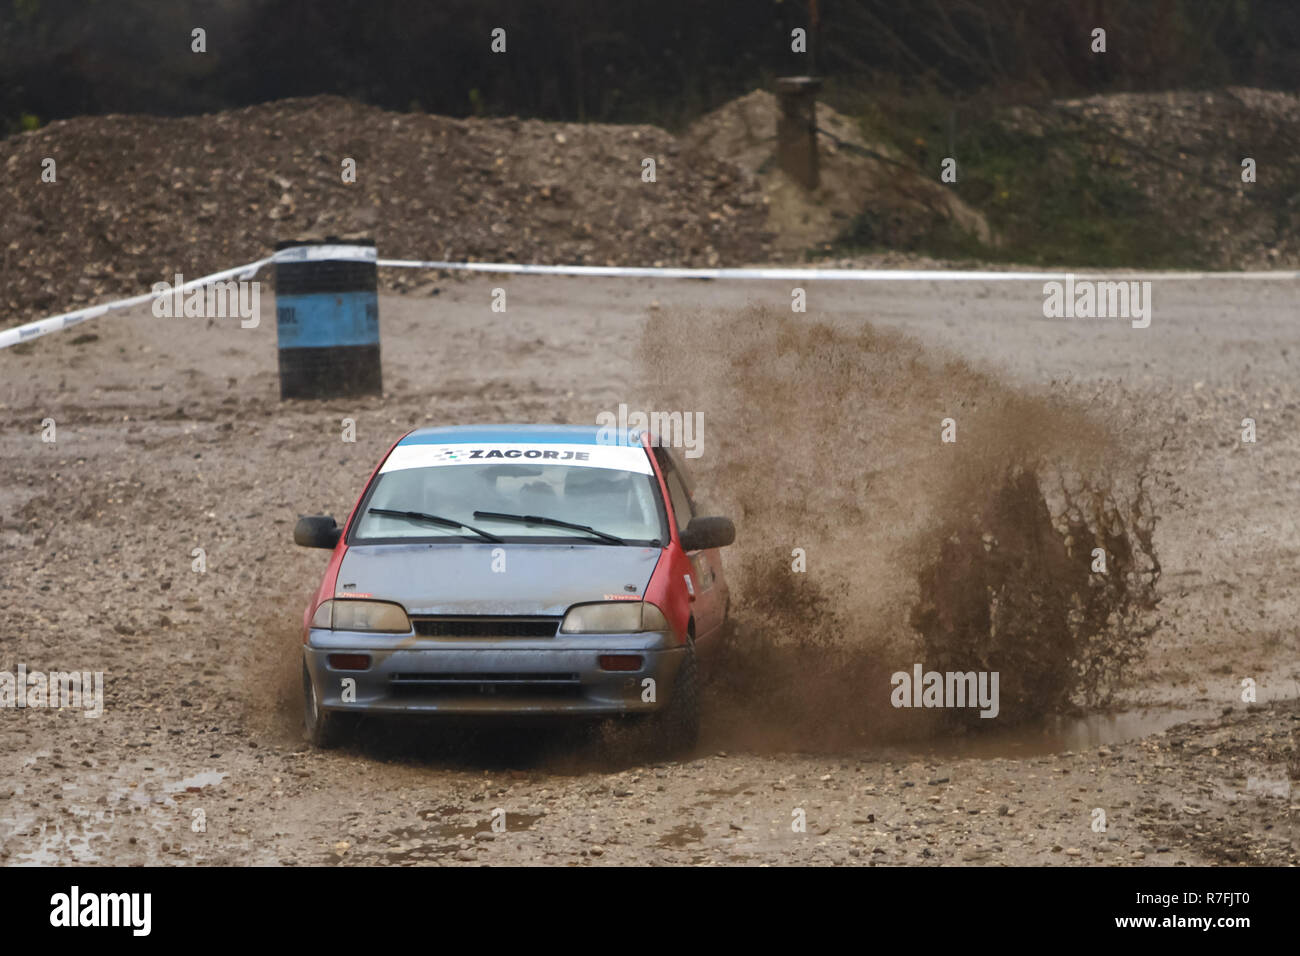 Sveta Nedjelja, Croatia - November 25, 2018. 9th Rally Show Santa Domenica. Vjekoslav Stubican and Josip Popovic from Croatia racing in the Suzuki Swi - Stock Image